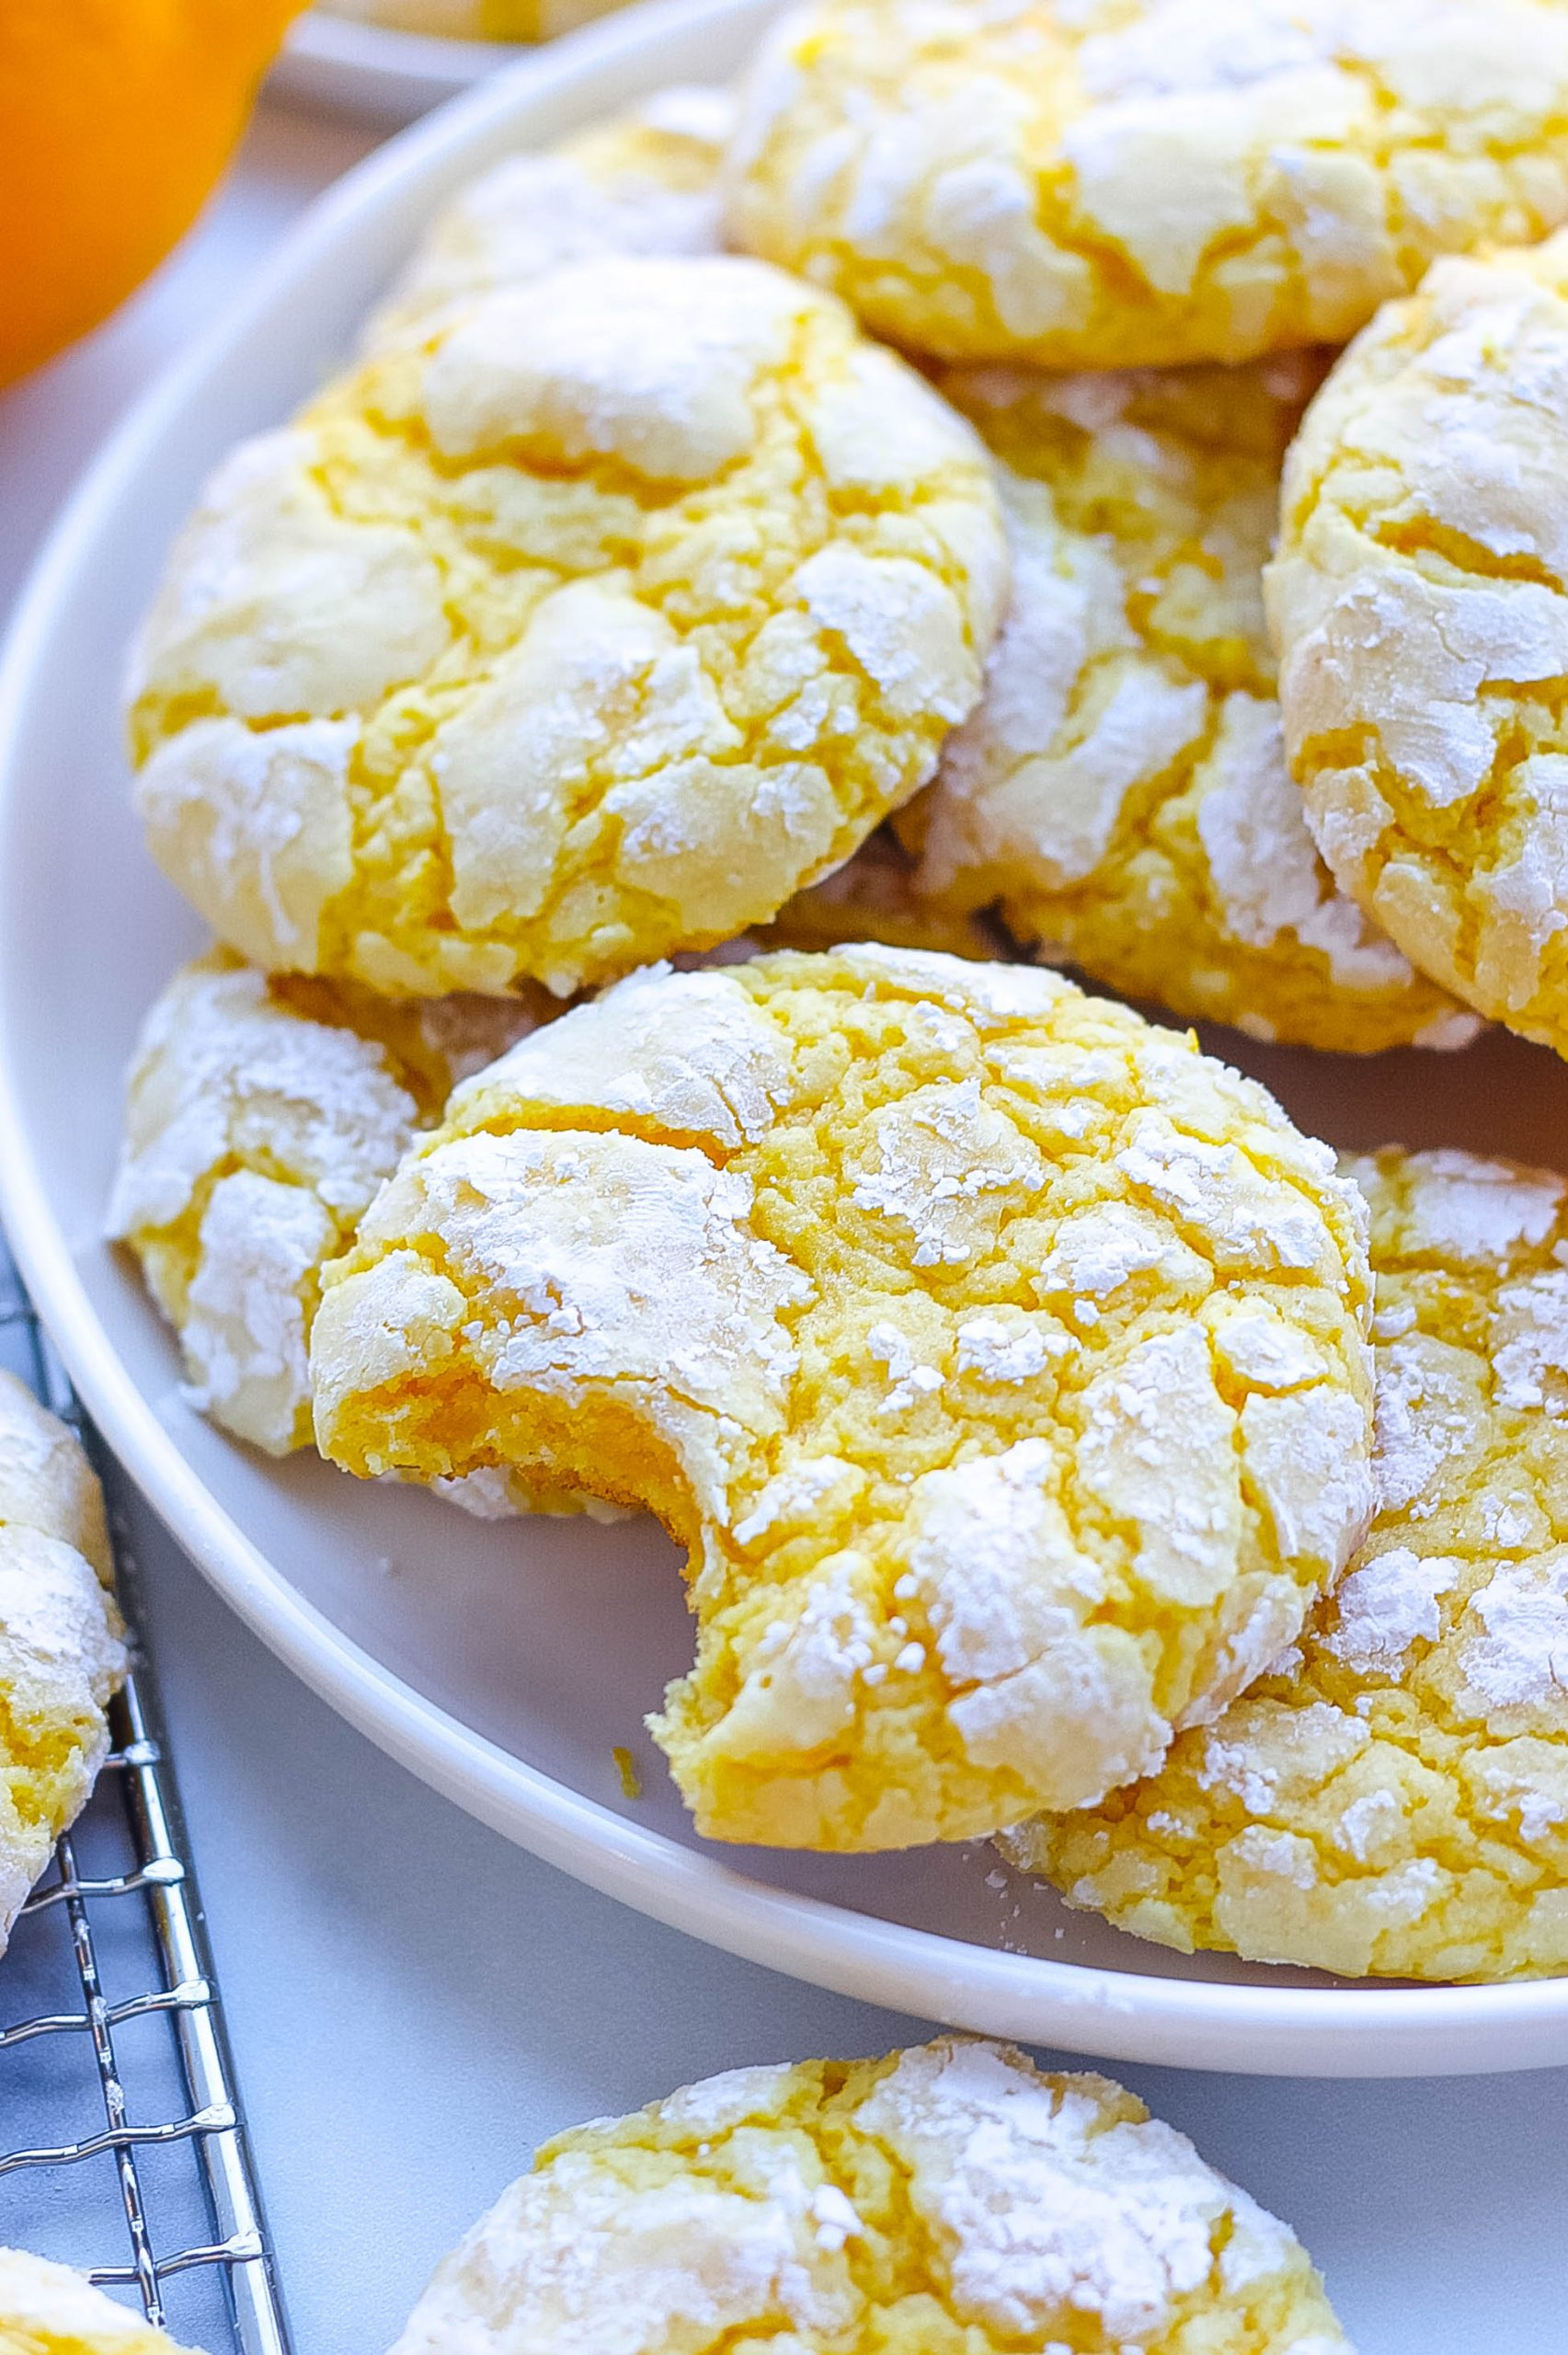 Lemon cookies on plate